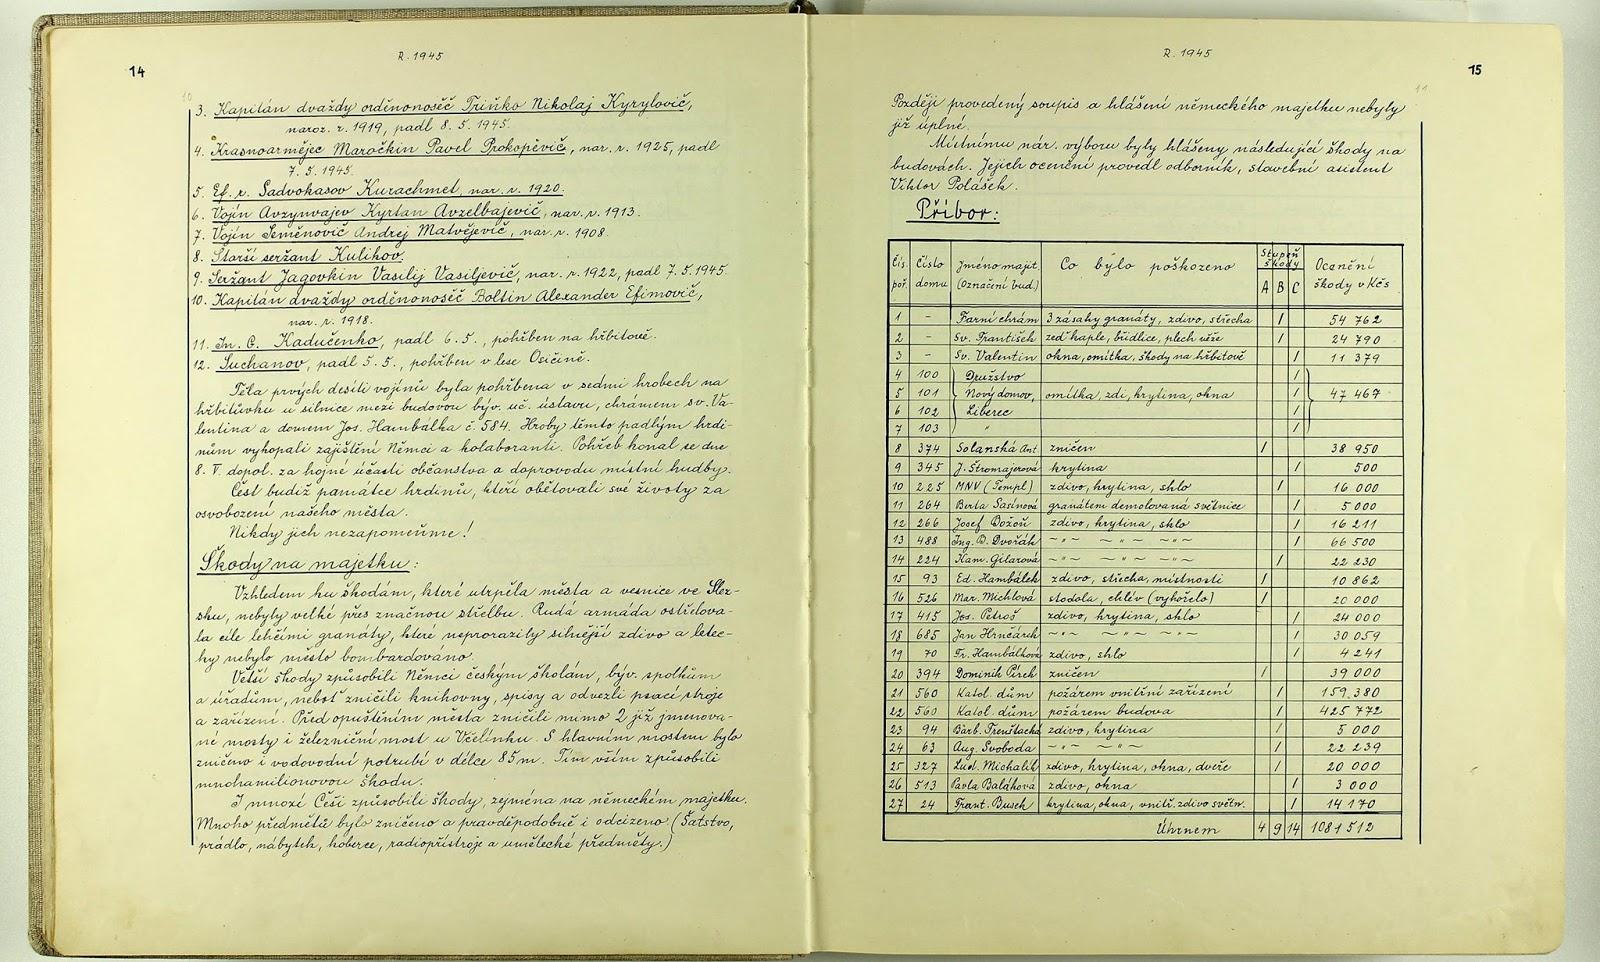 Летописи города Пршибор, 1945 год. Стр. 14-15